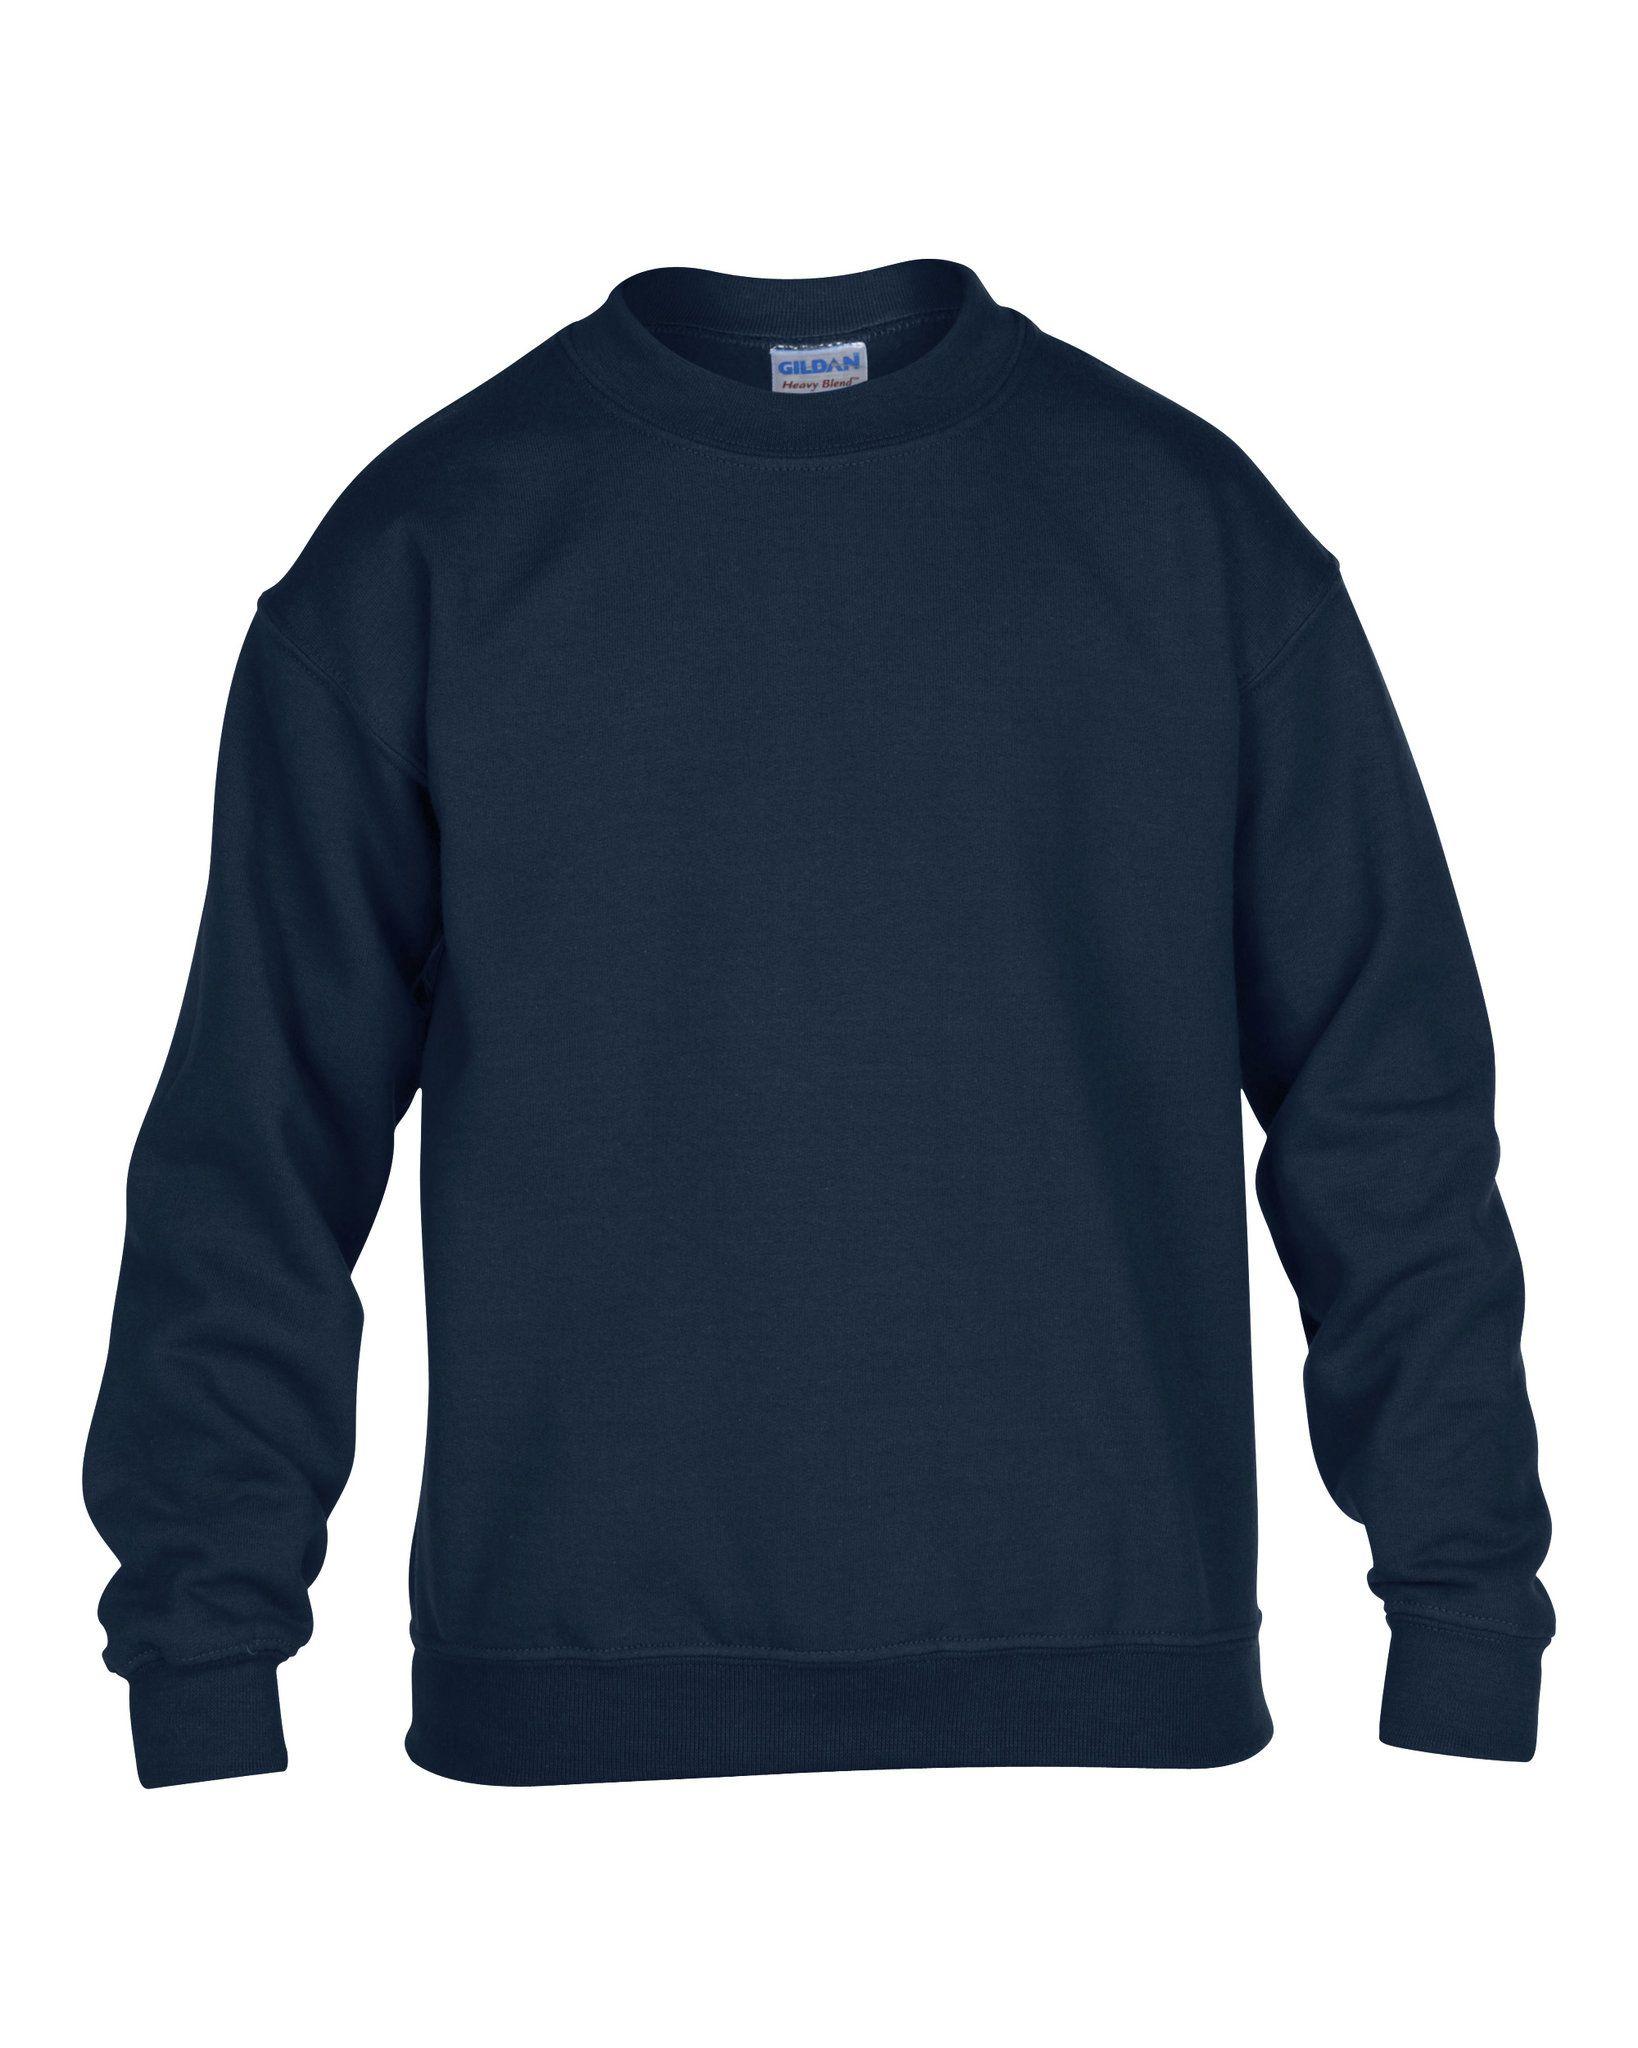 Sweatshirt publicitaire Crewneck rouge - sweatshirt personnalisable